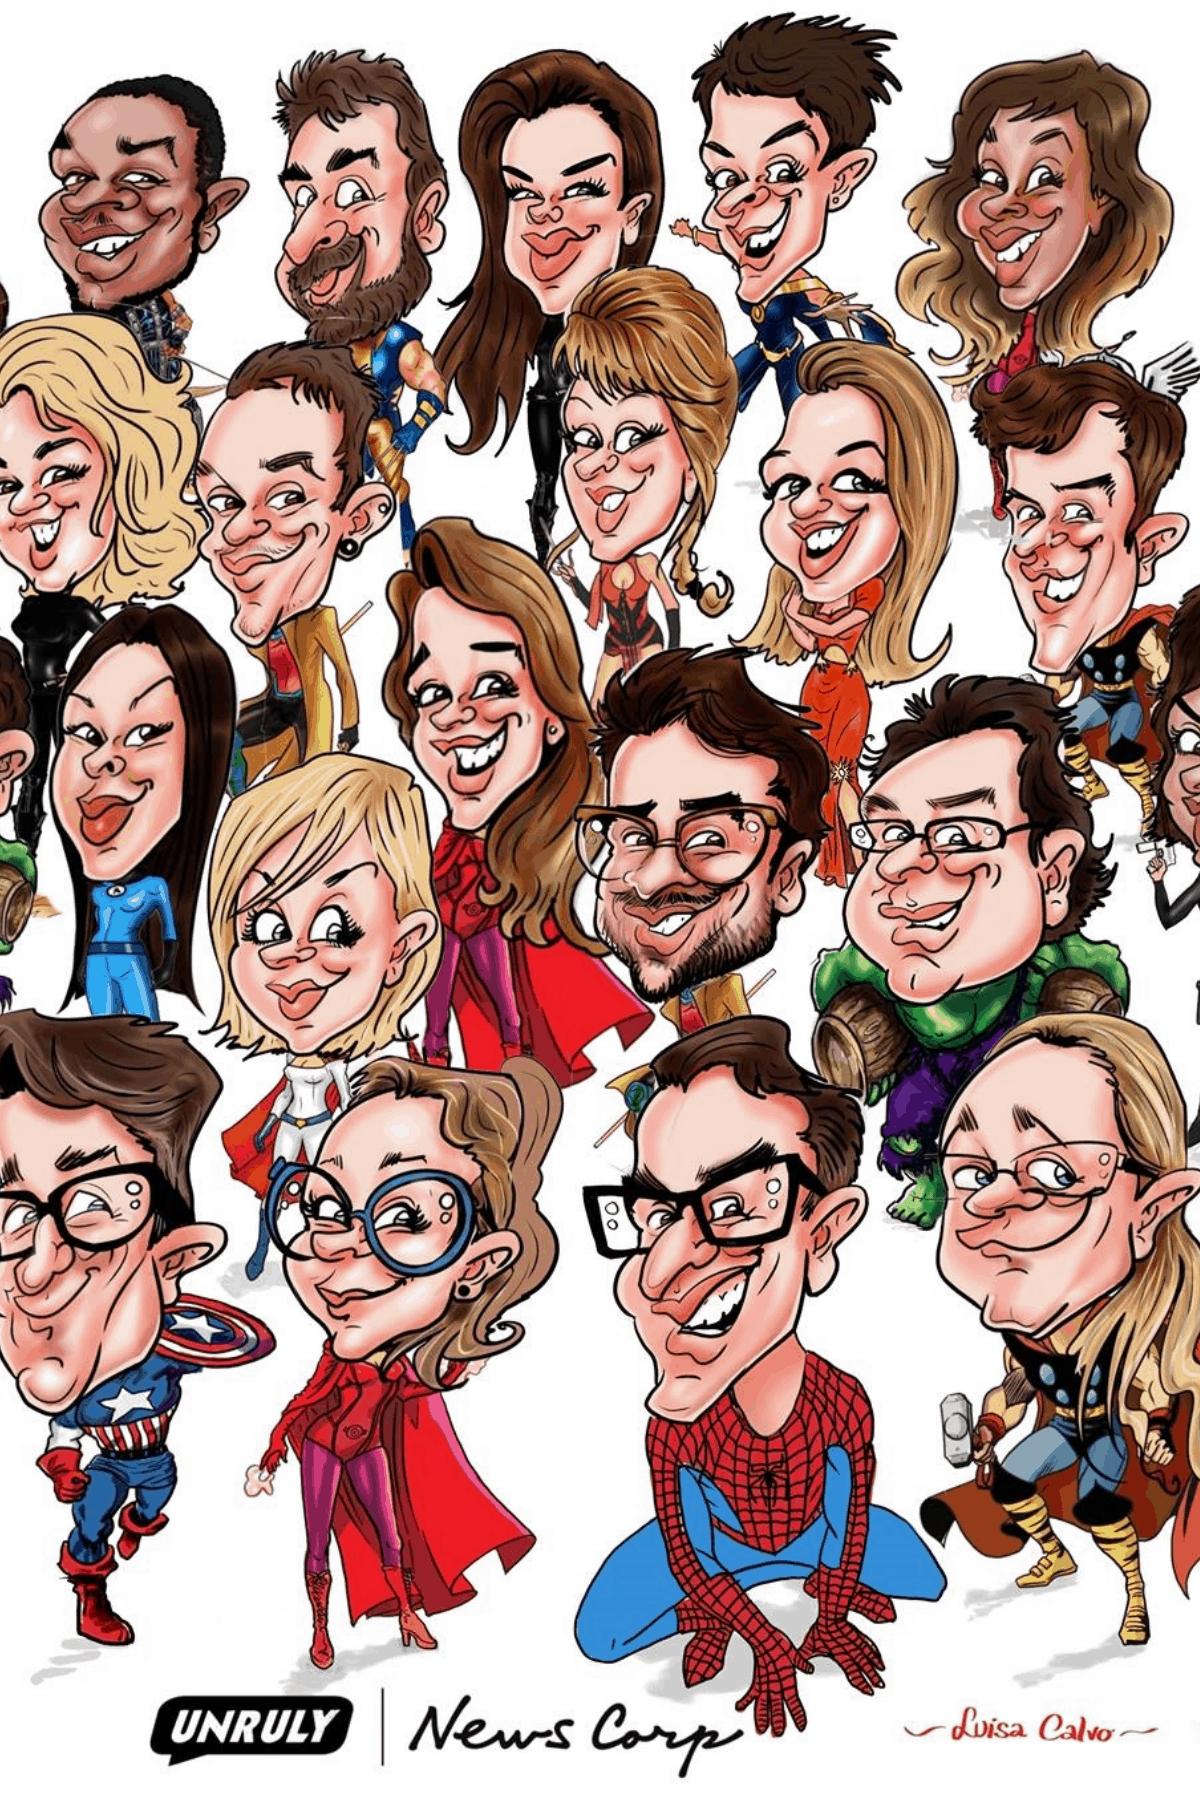 LIVE digital superhero caricatures__BY LUISA CALVO